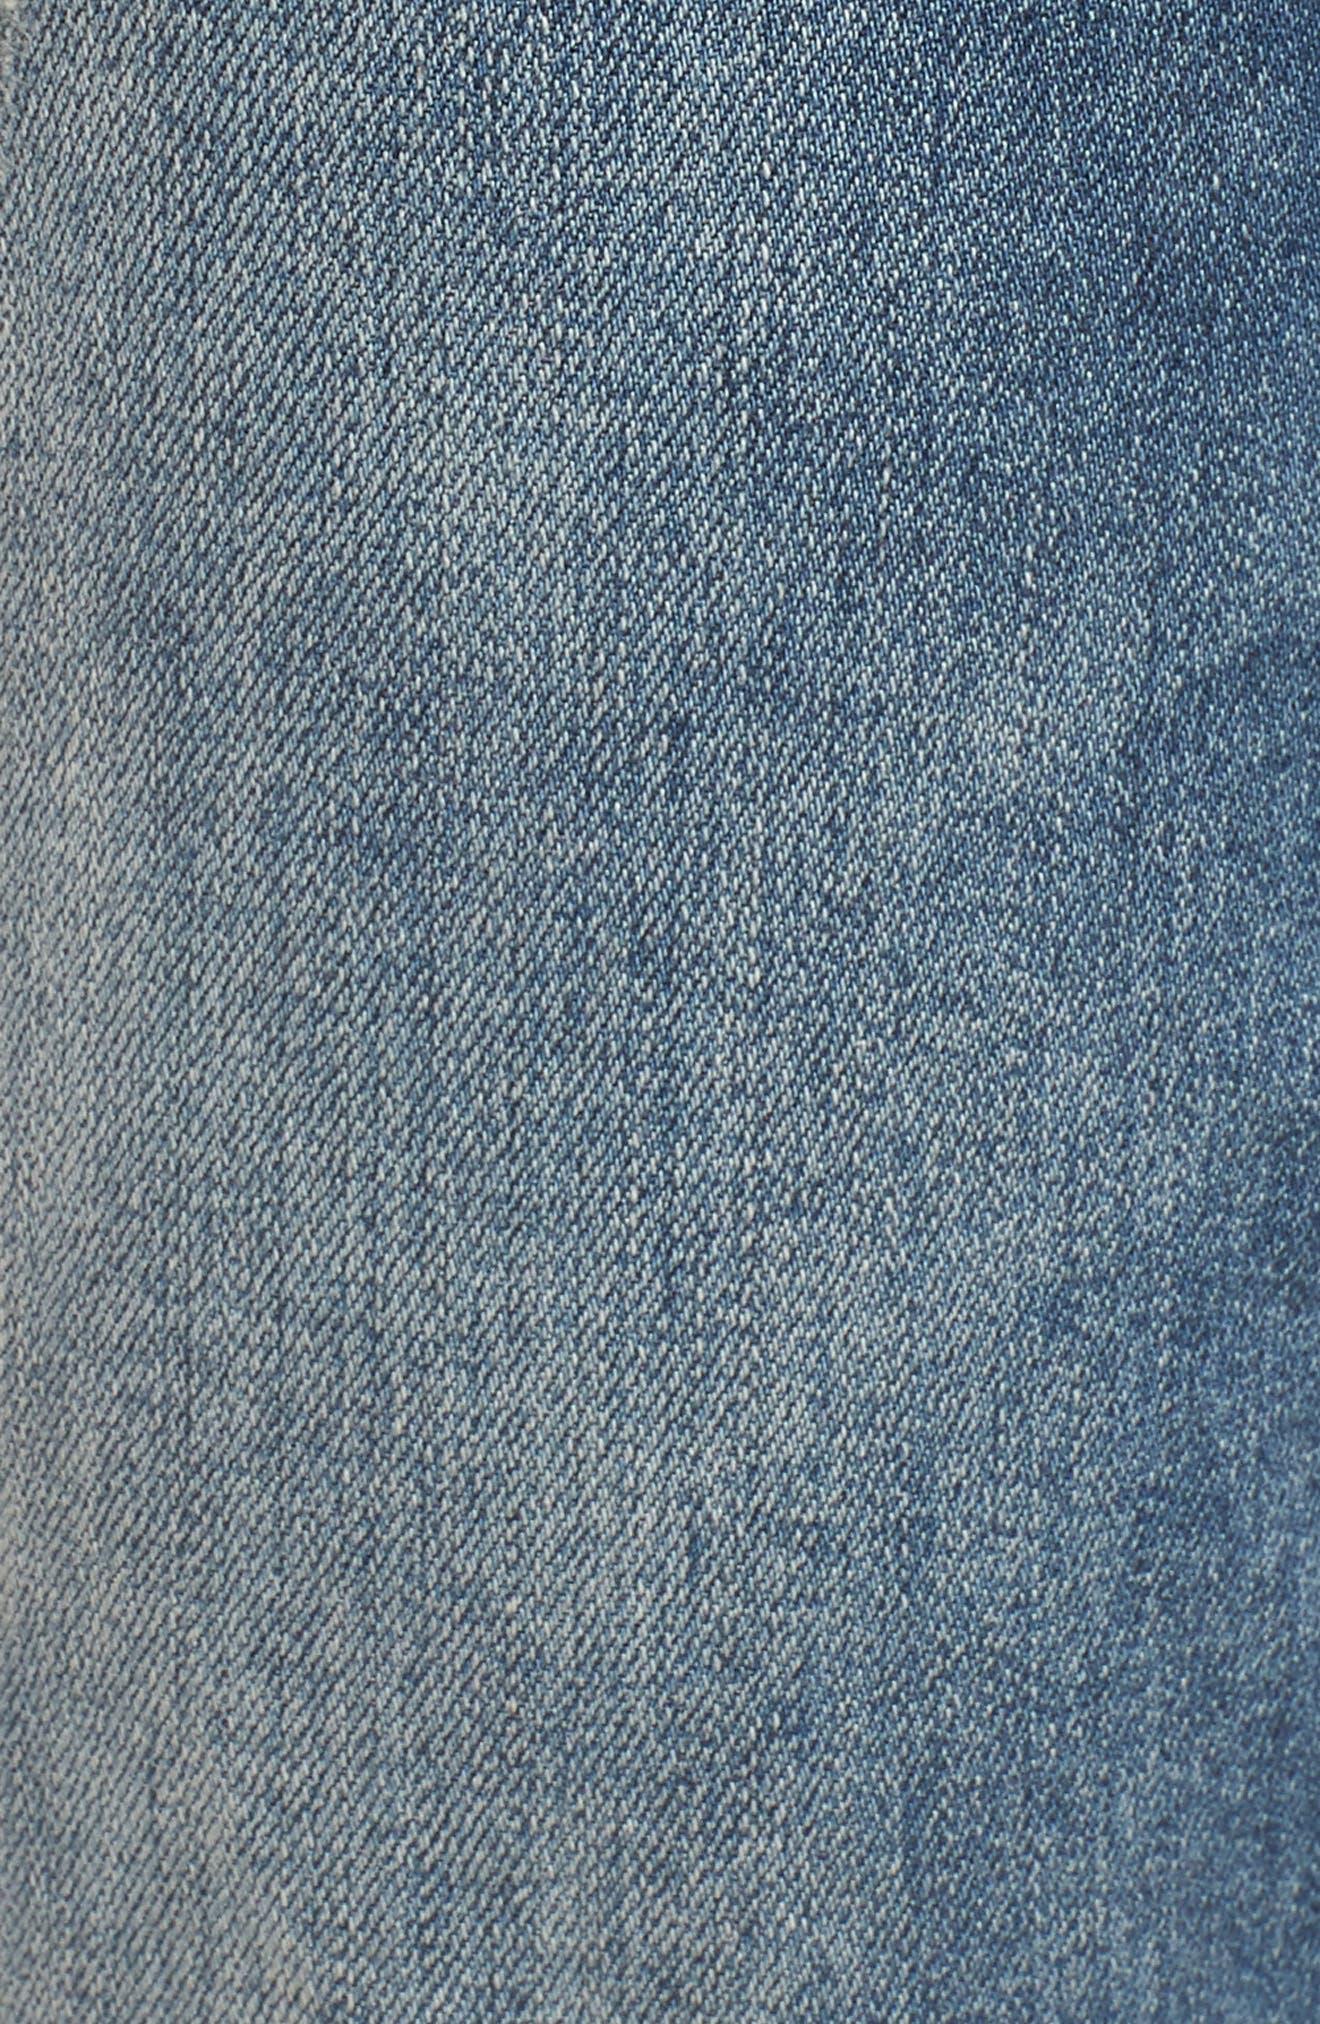 Distressed Skinny Jeans,                             Alternate thumbnail 6, color,                             LIGHT WASH